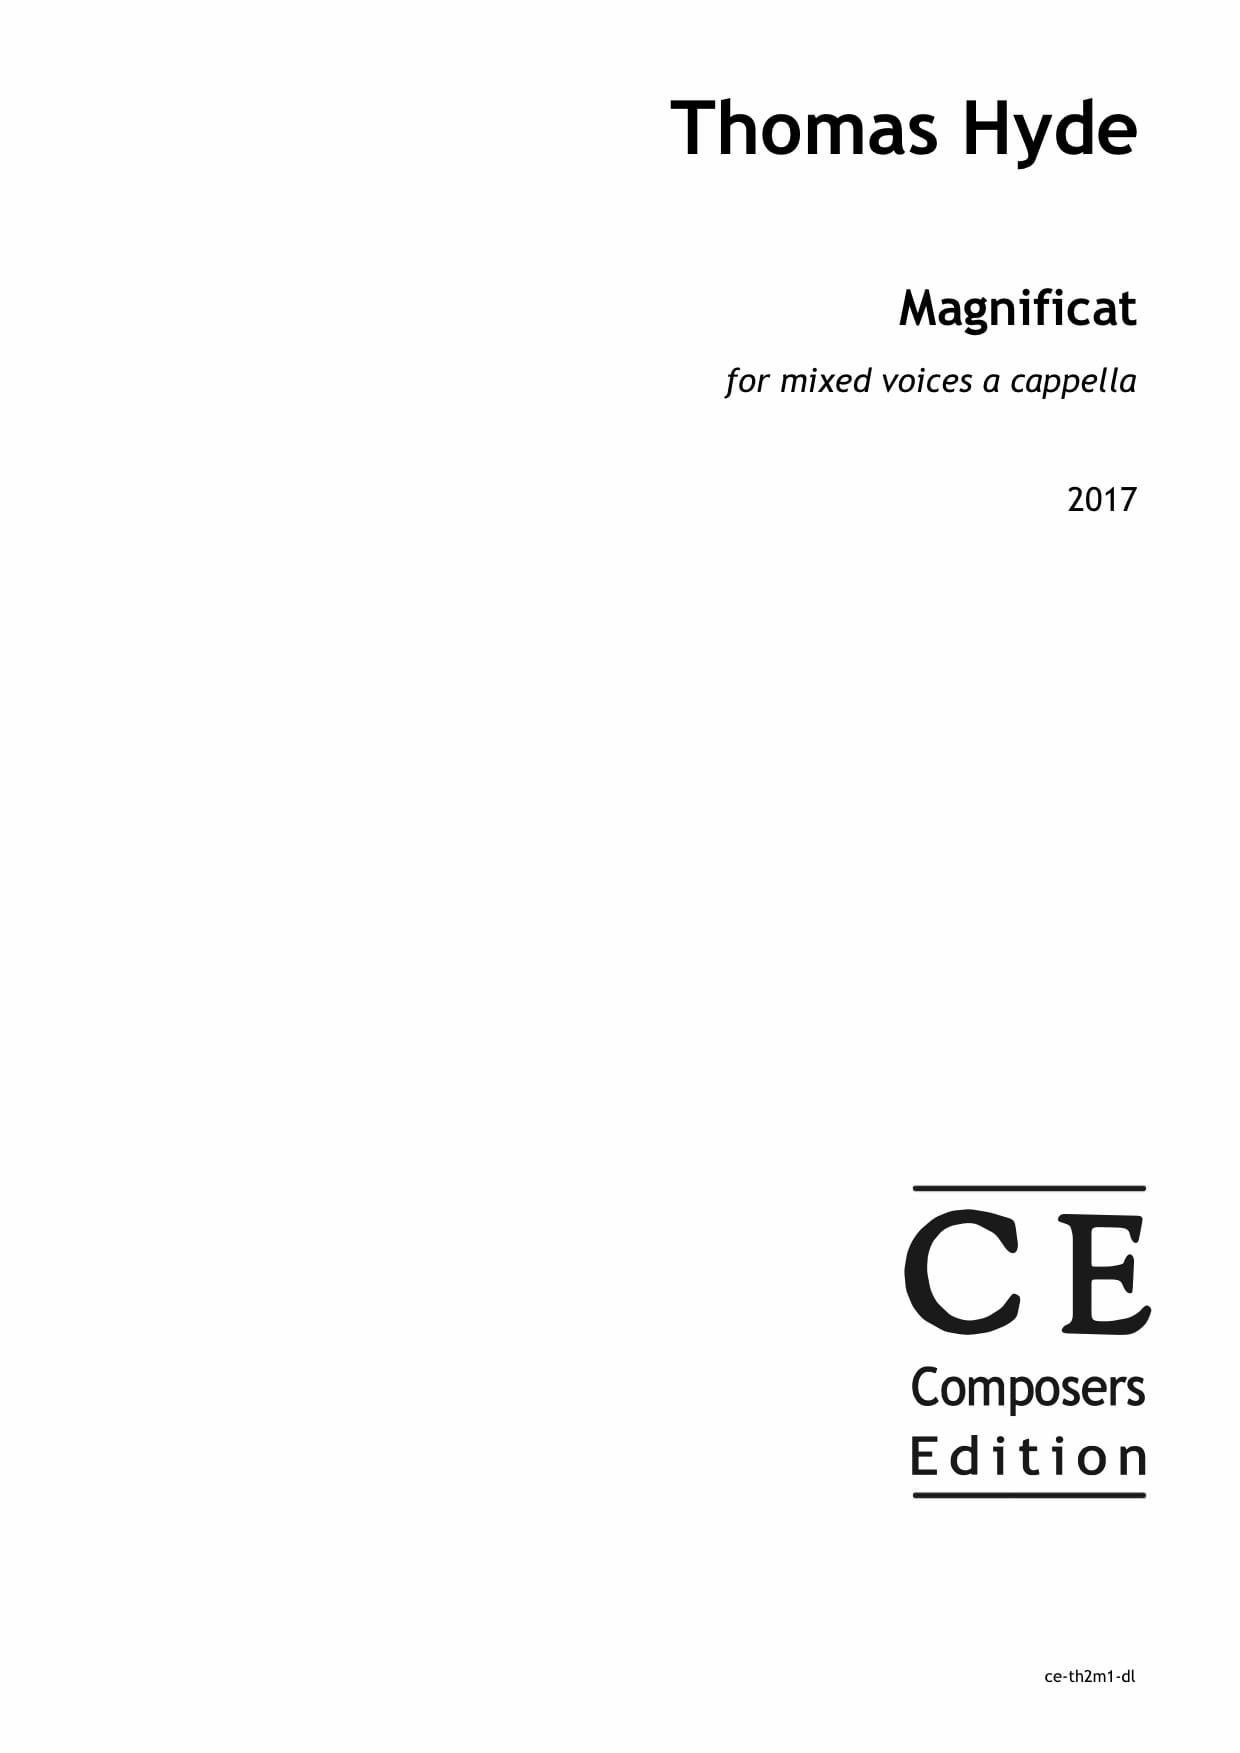 Thomas Hyde: Magnificat for mixed voices a cappella